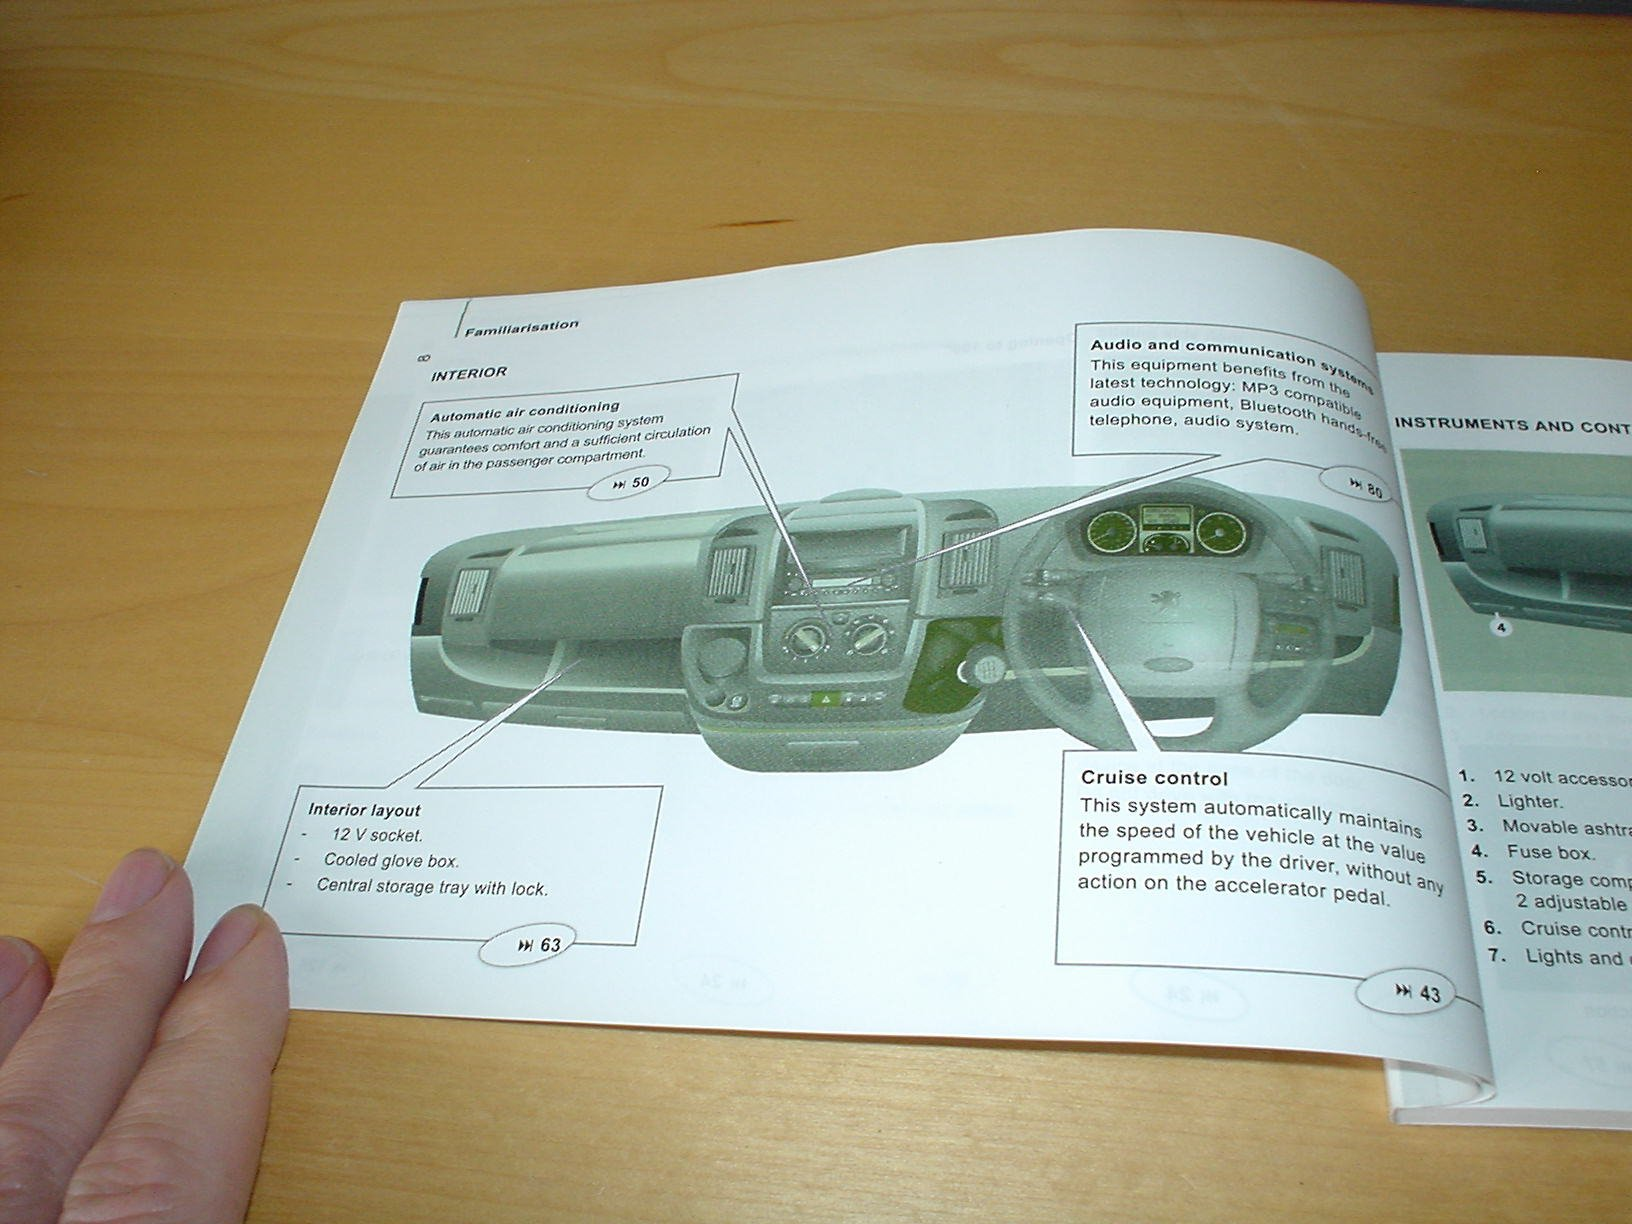 PEUGEOT BOXER VAN OWNERS HANDBOOK c/w WALLET (2006 - 2011) 2.2 & 3.0 HDI  DIESEL ENGINE - OWNER'S HAND BOOK MANUAL: Amazon.co.uk: PEUGEOT: Books